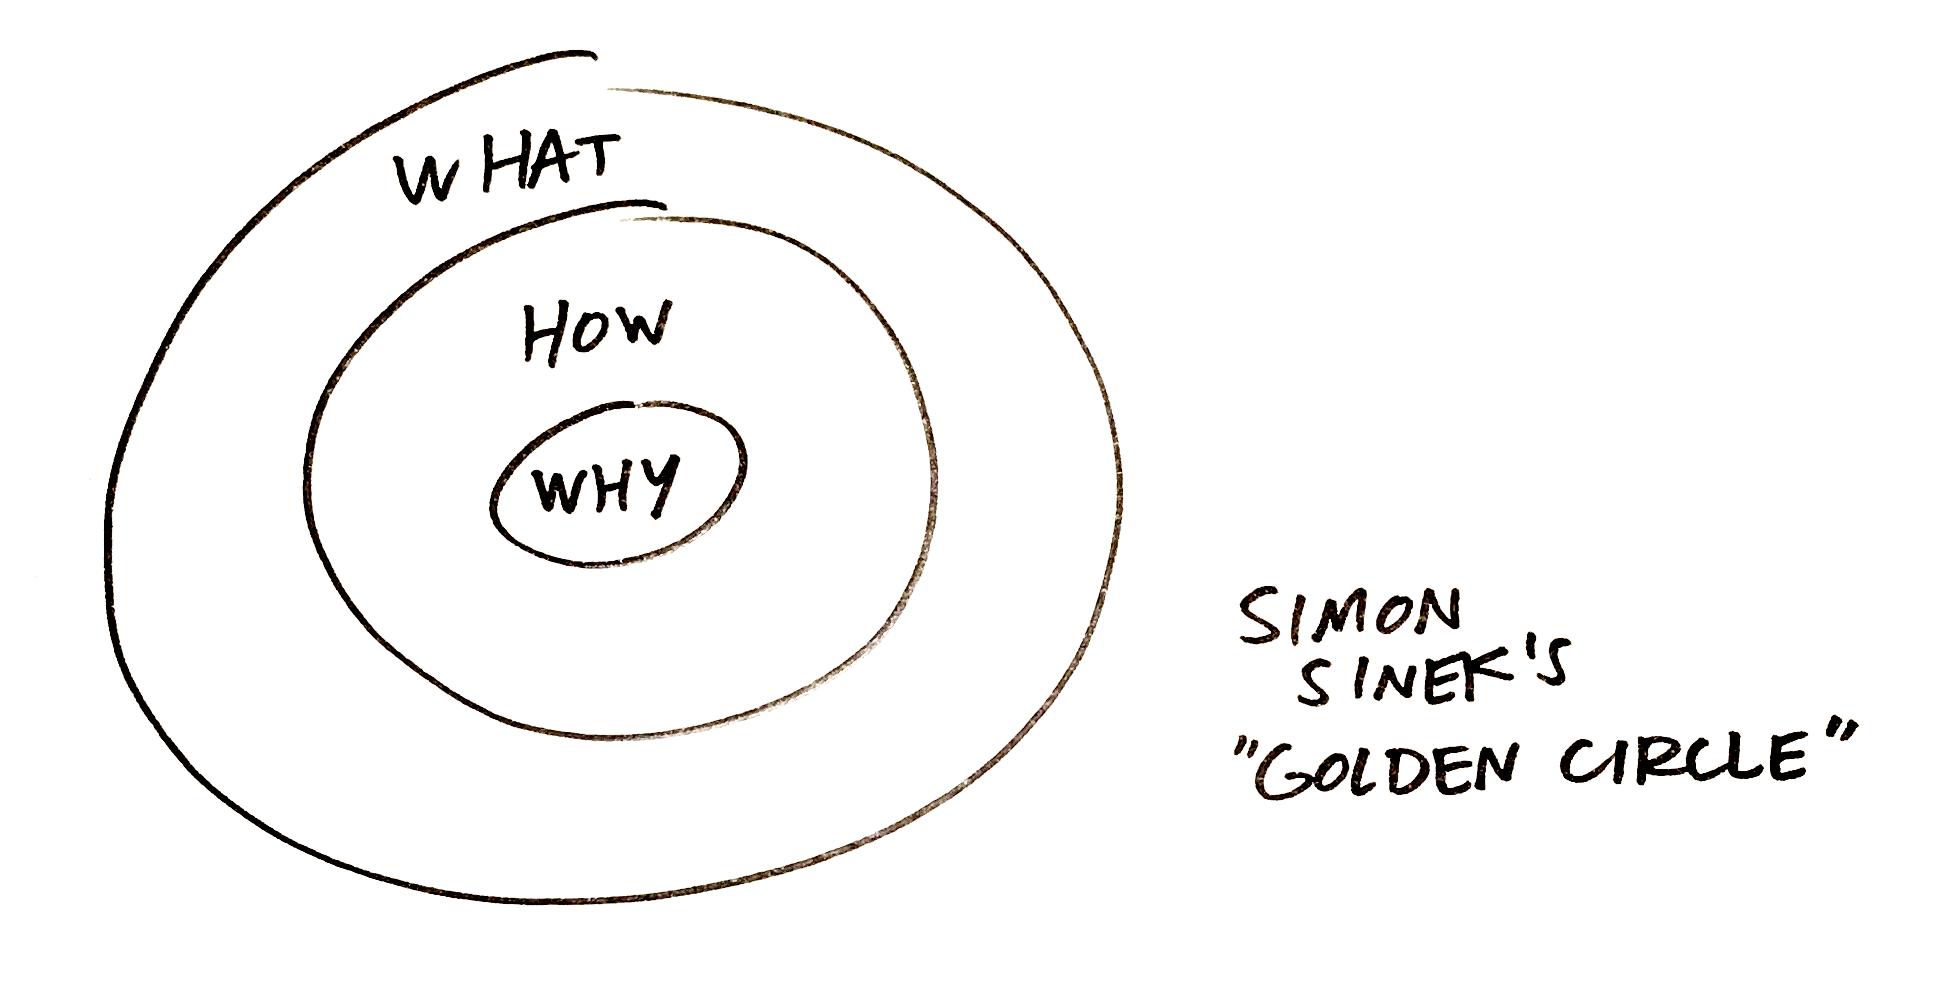 Brand circles